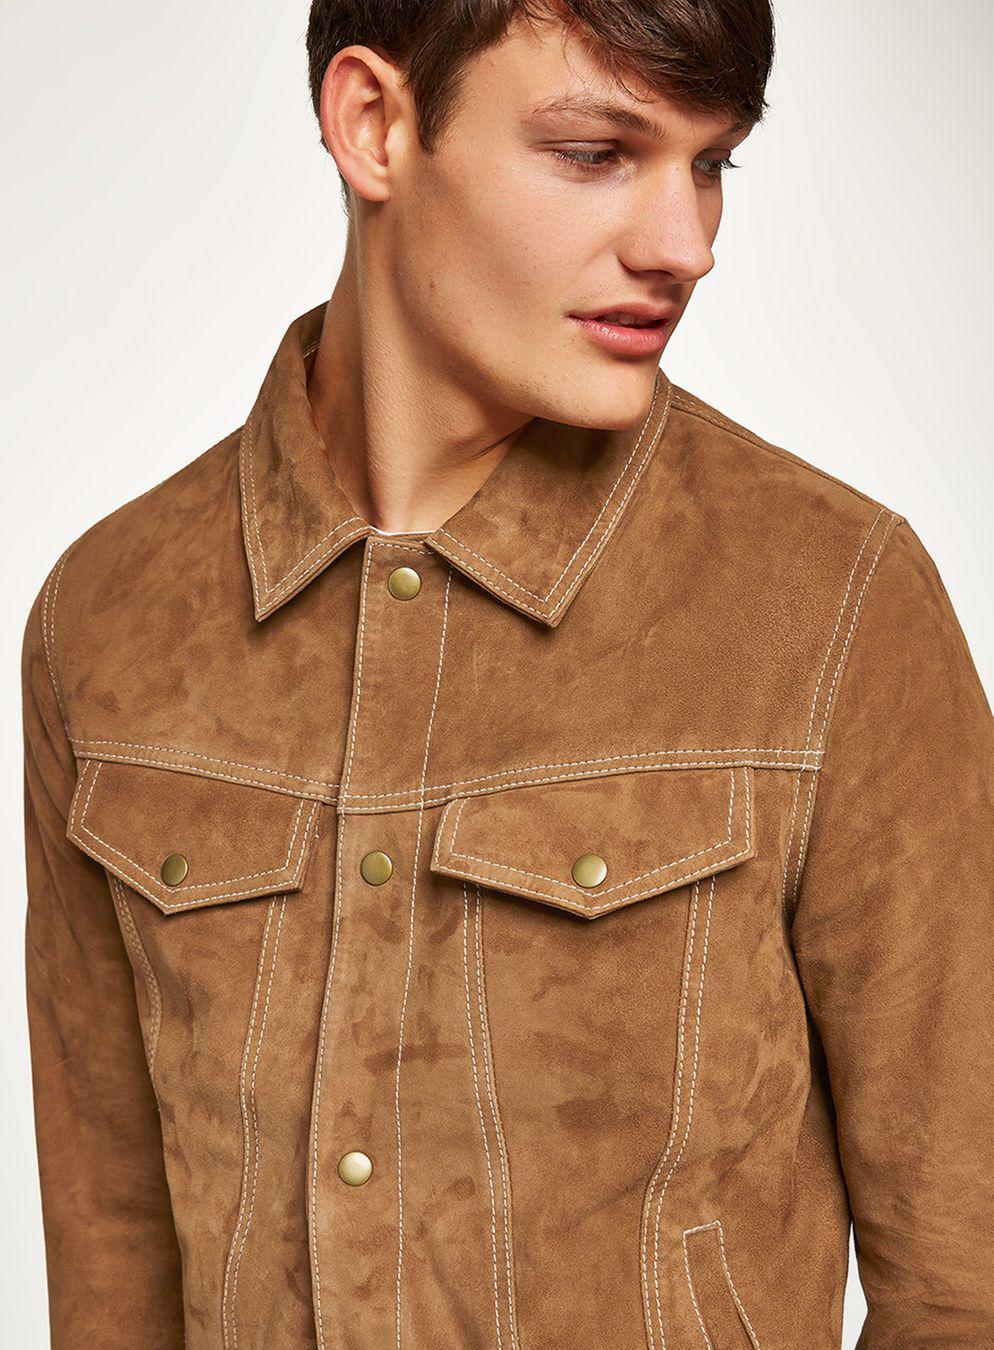 TOPMAN Tan Suede Western Jacket in Brown for Men